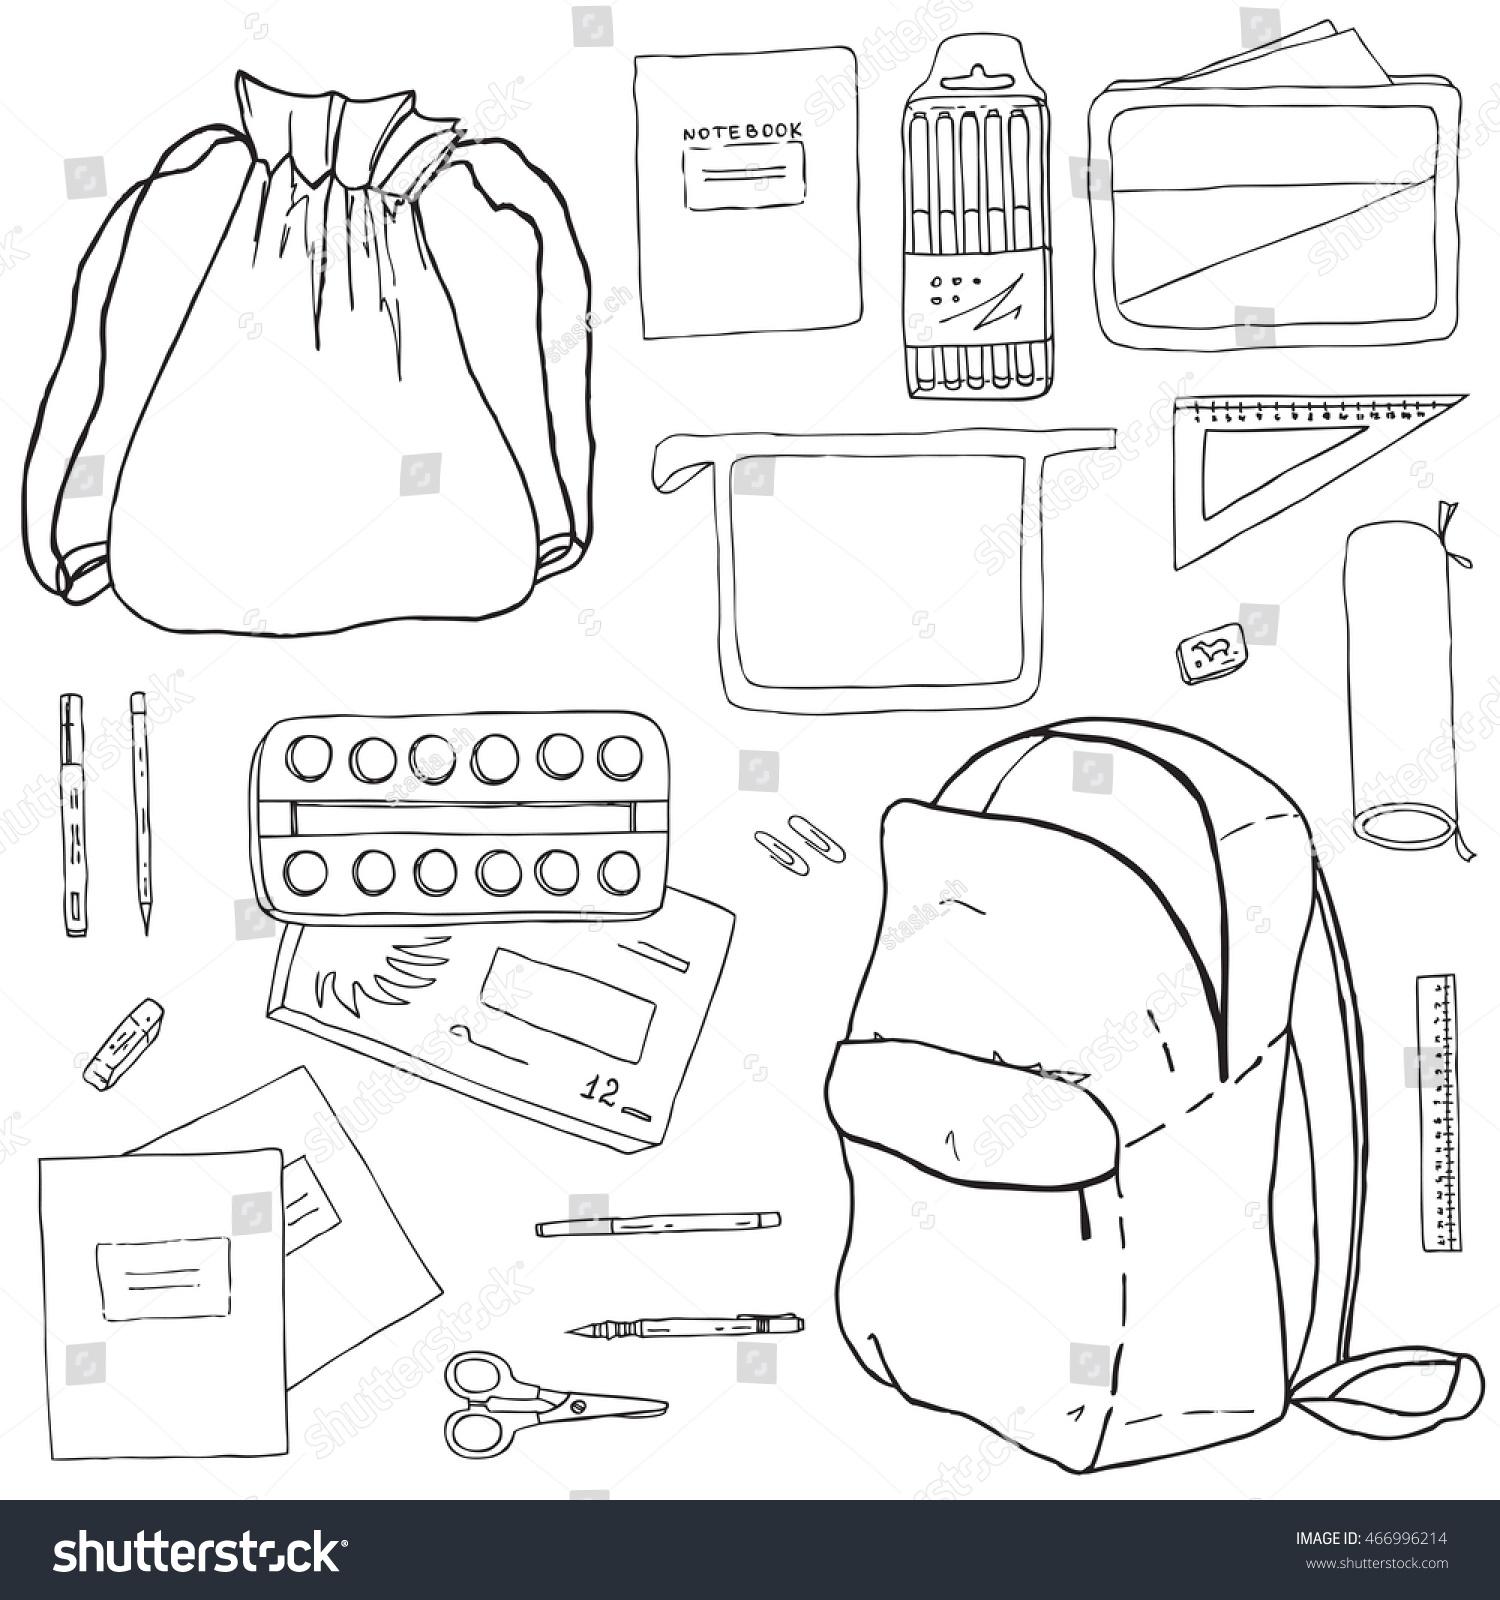 School bag diagram - Vector Set Of School Supplies Hand Drawn Ink Pictures Of Backpack School Bag For